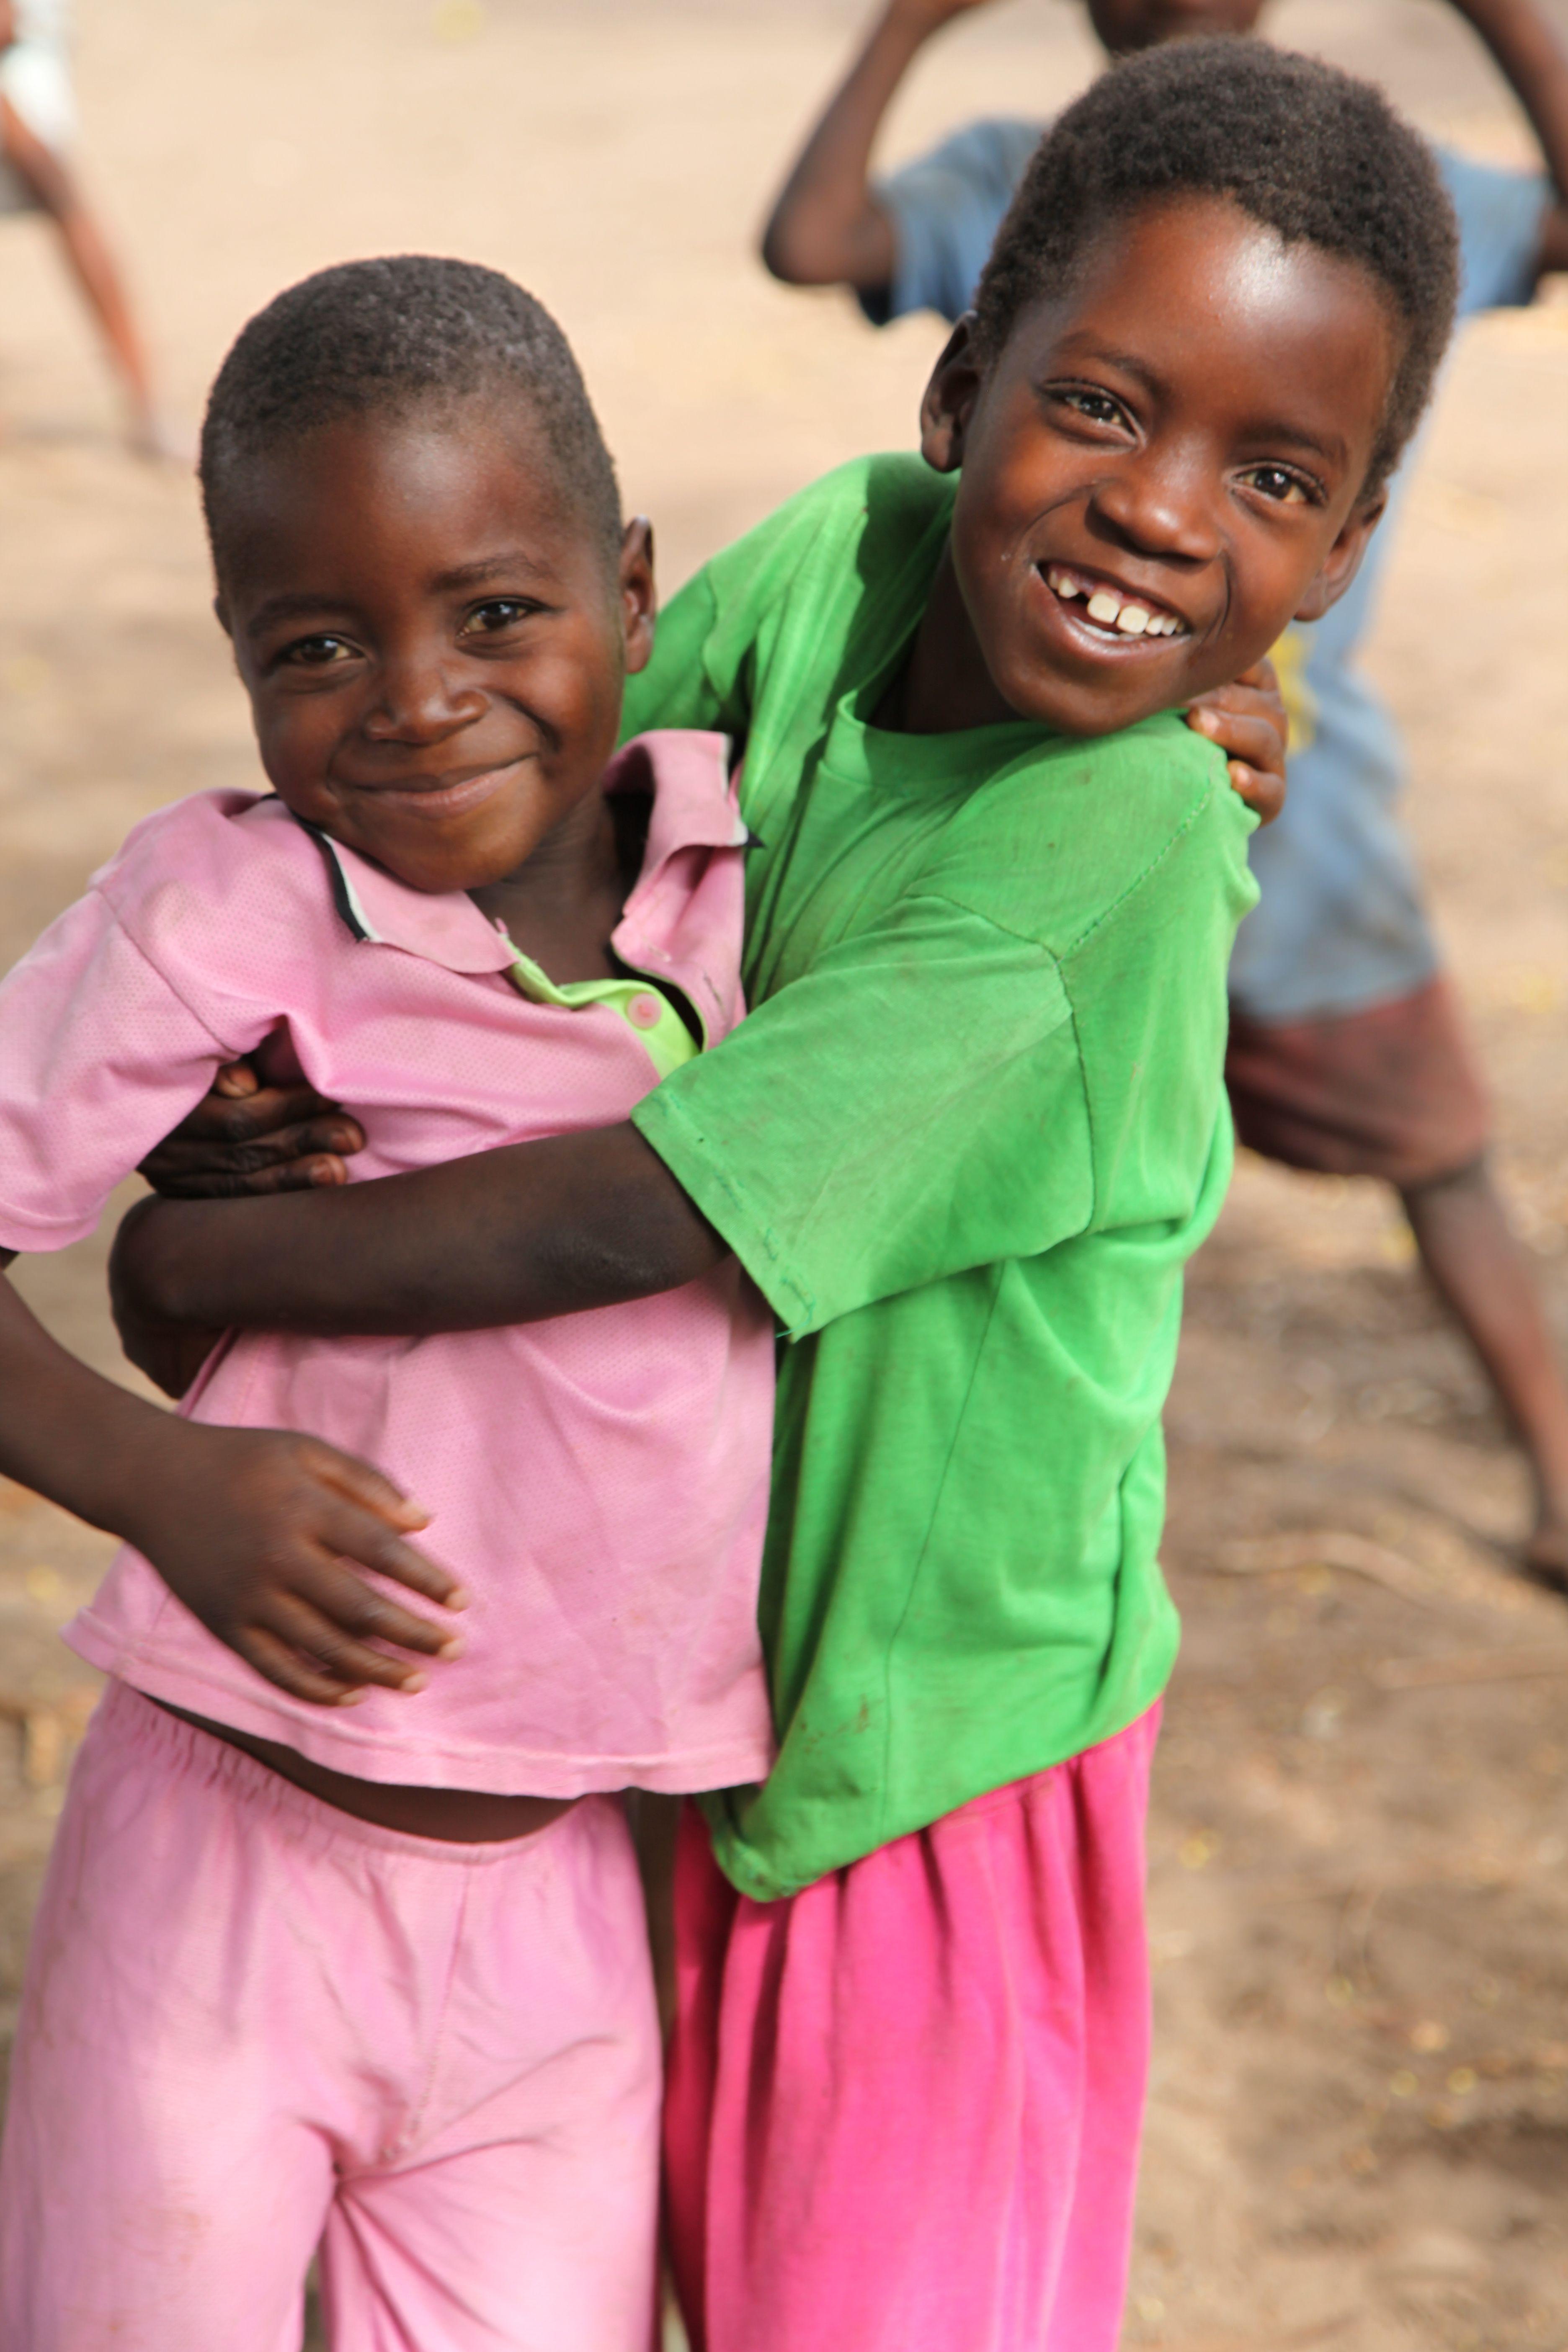 #NFPS #HELPChildren #Malawi #Classmates